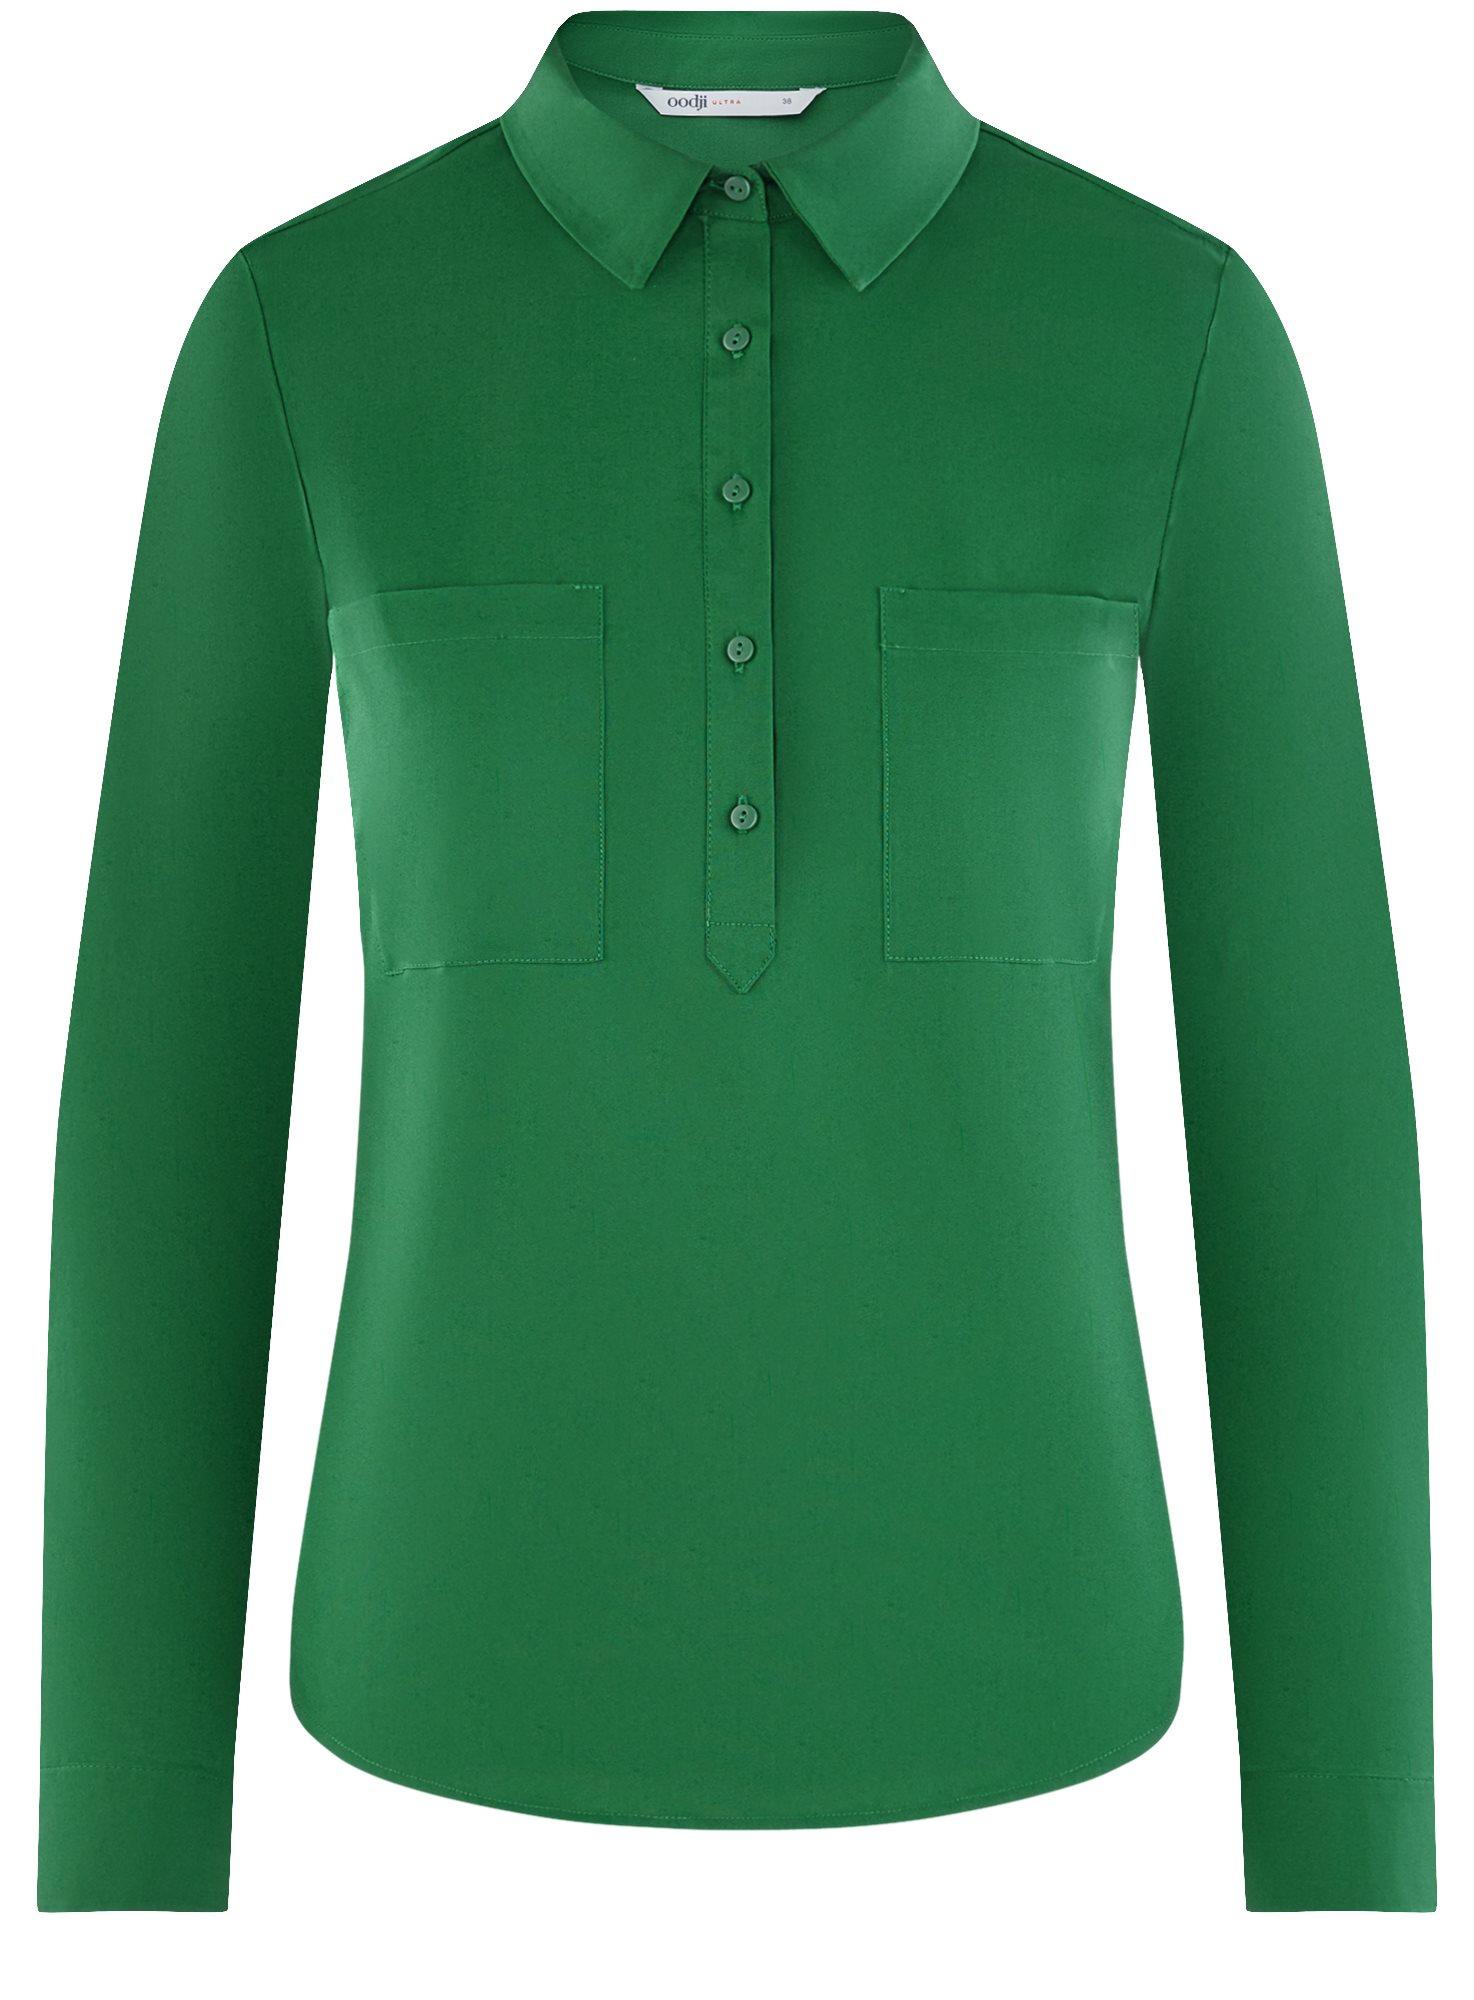 Рубашка базовая с нагрудными карманами oodji для женщины (зеленый), 11403222B/42468/6E00N